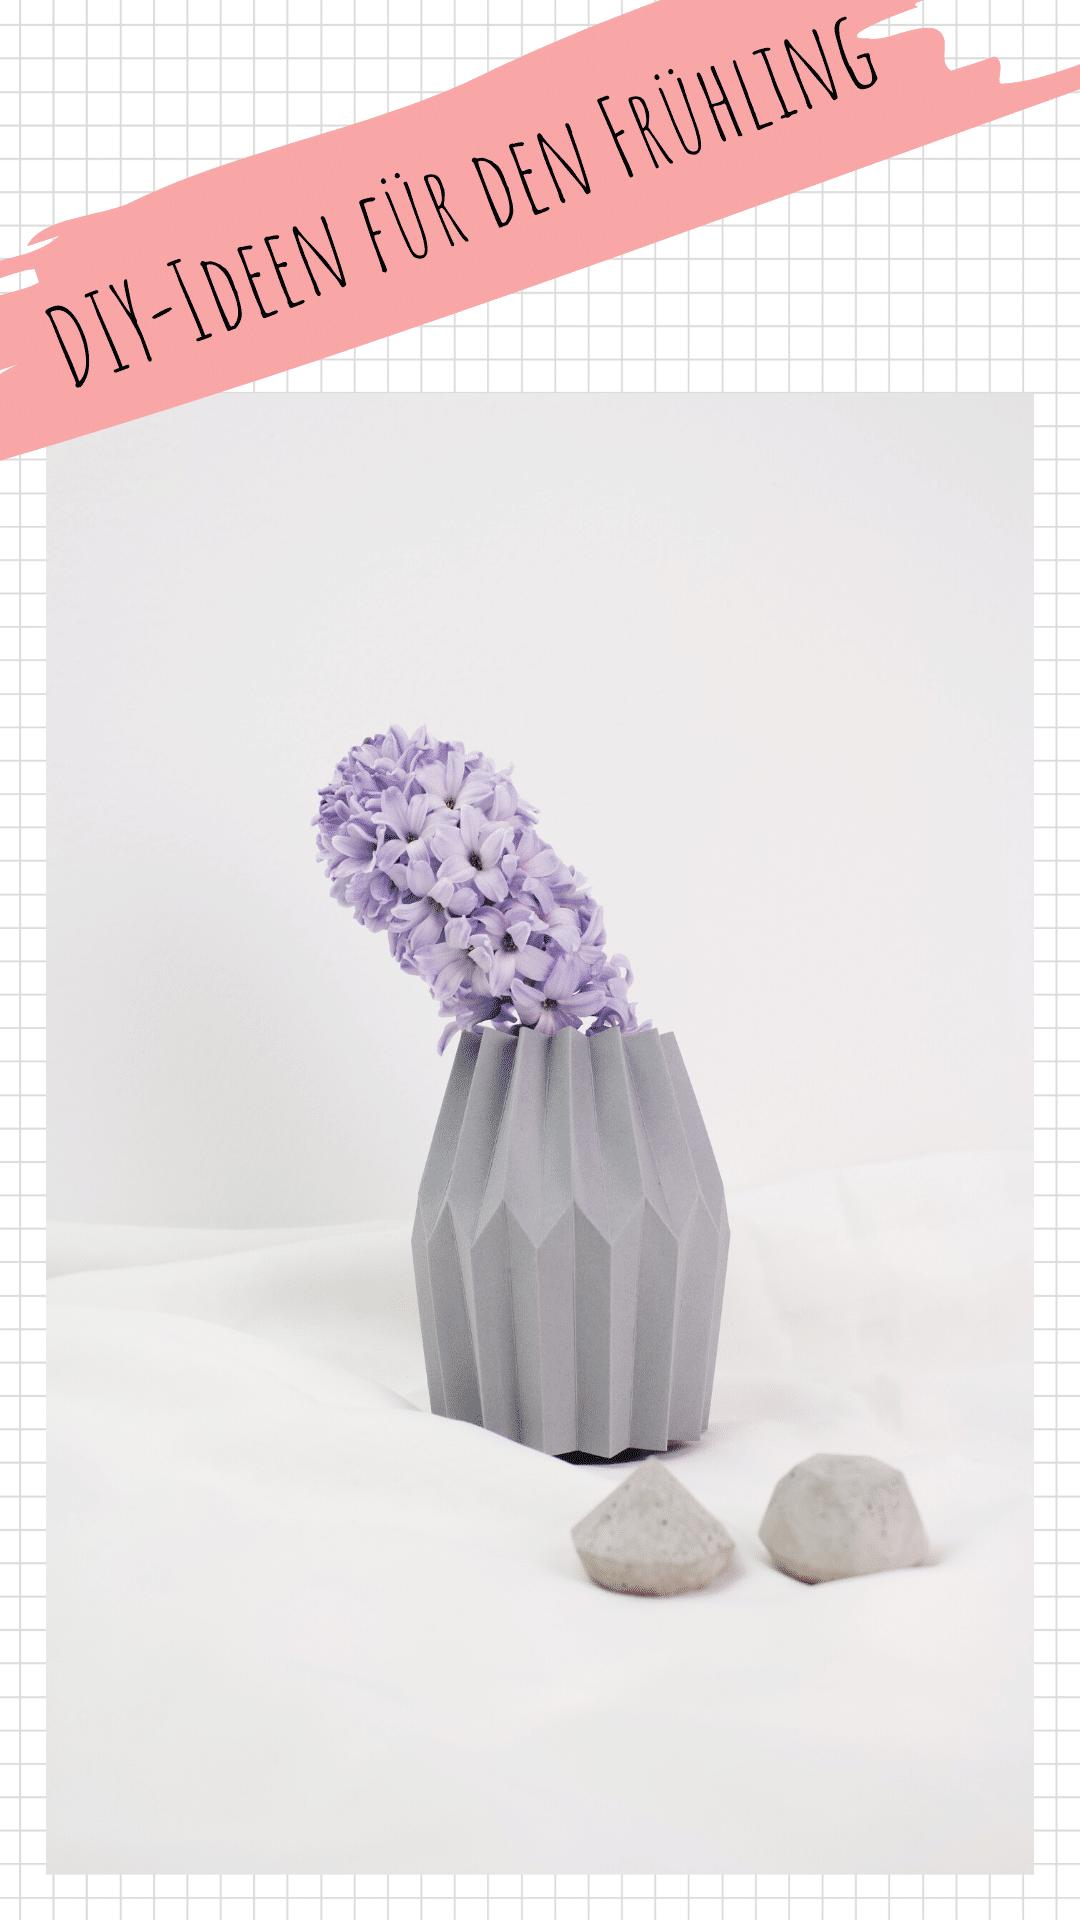 DIY Ideen für den Frühling